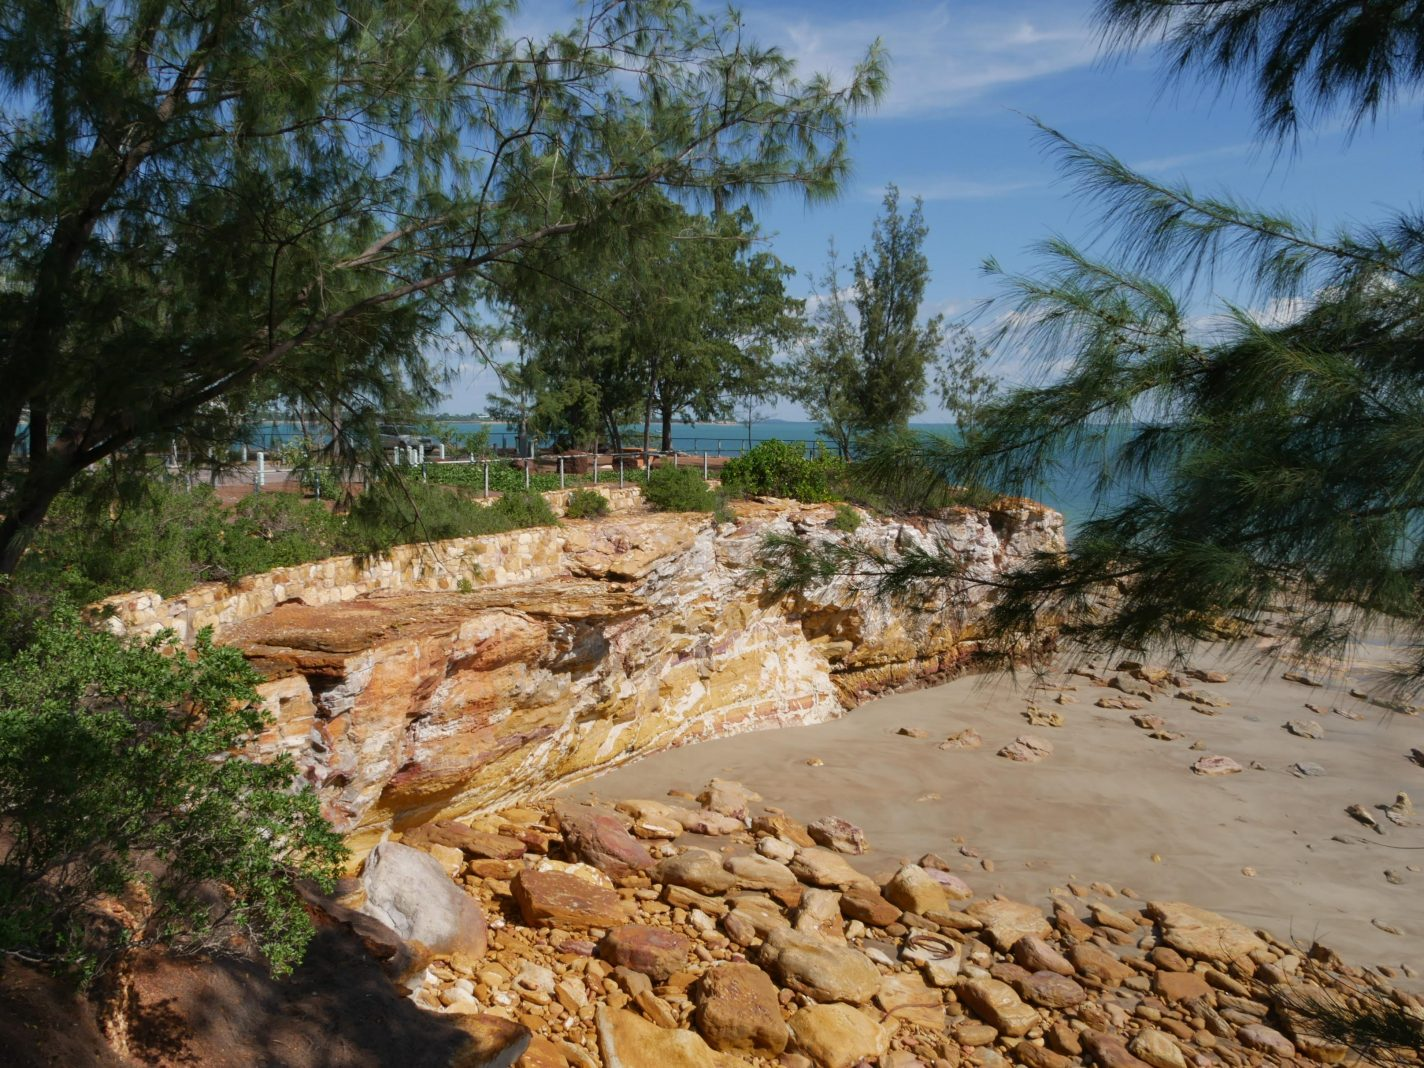 De kust bij East Point Reserve - Mooiste plekjes van Darwin